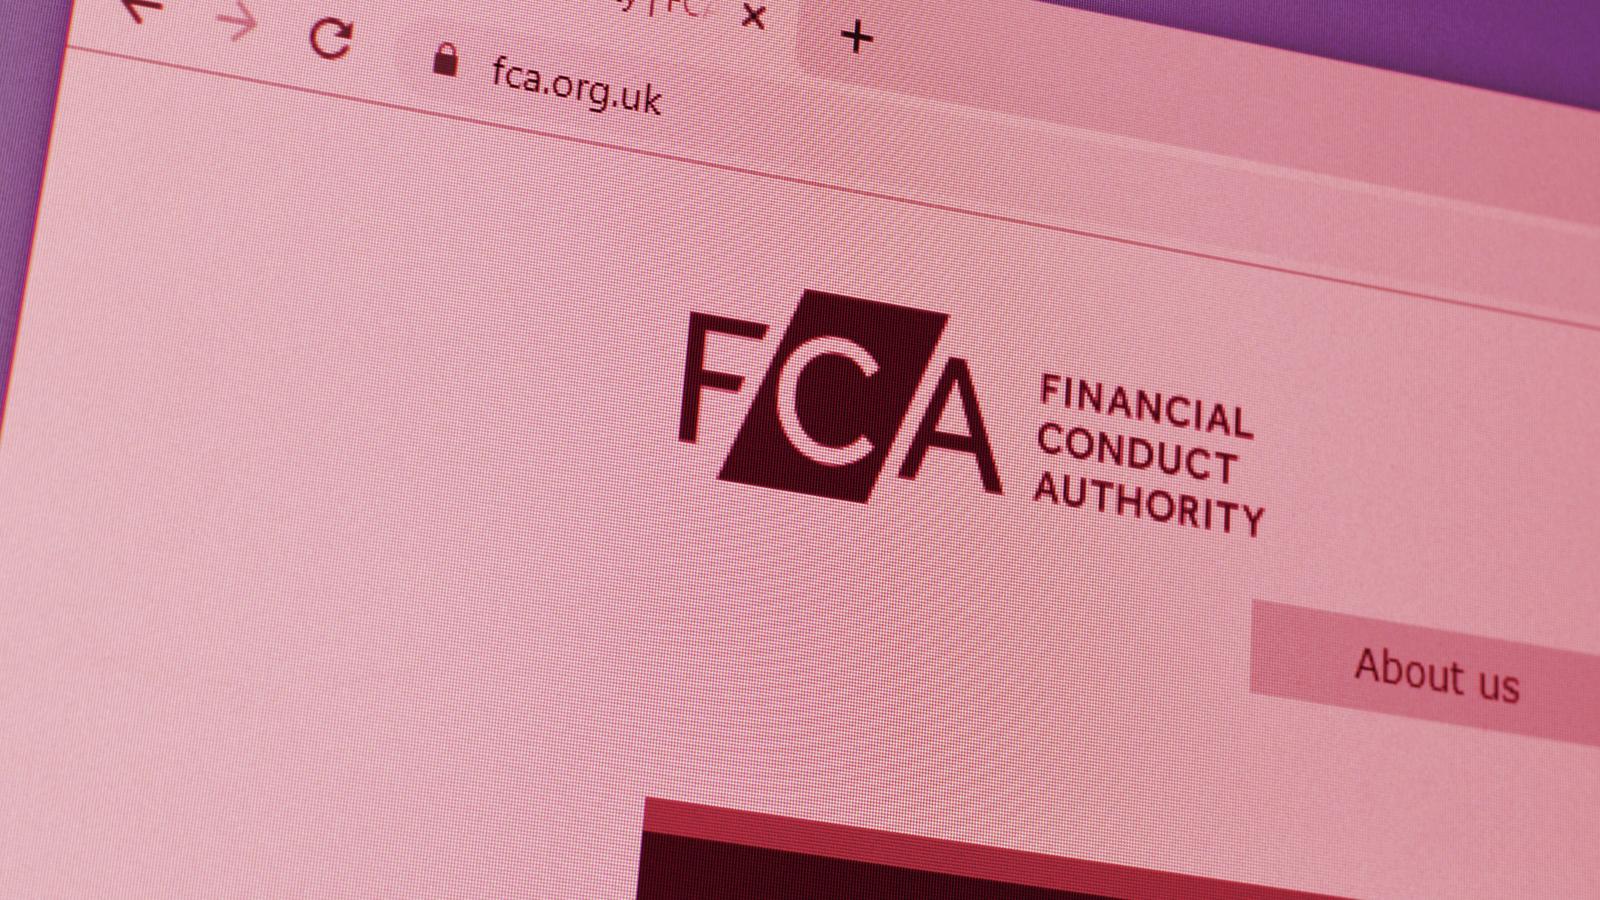 More UK Citizens Confident Investing in Crypto: FCA Survey